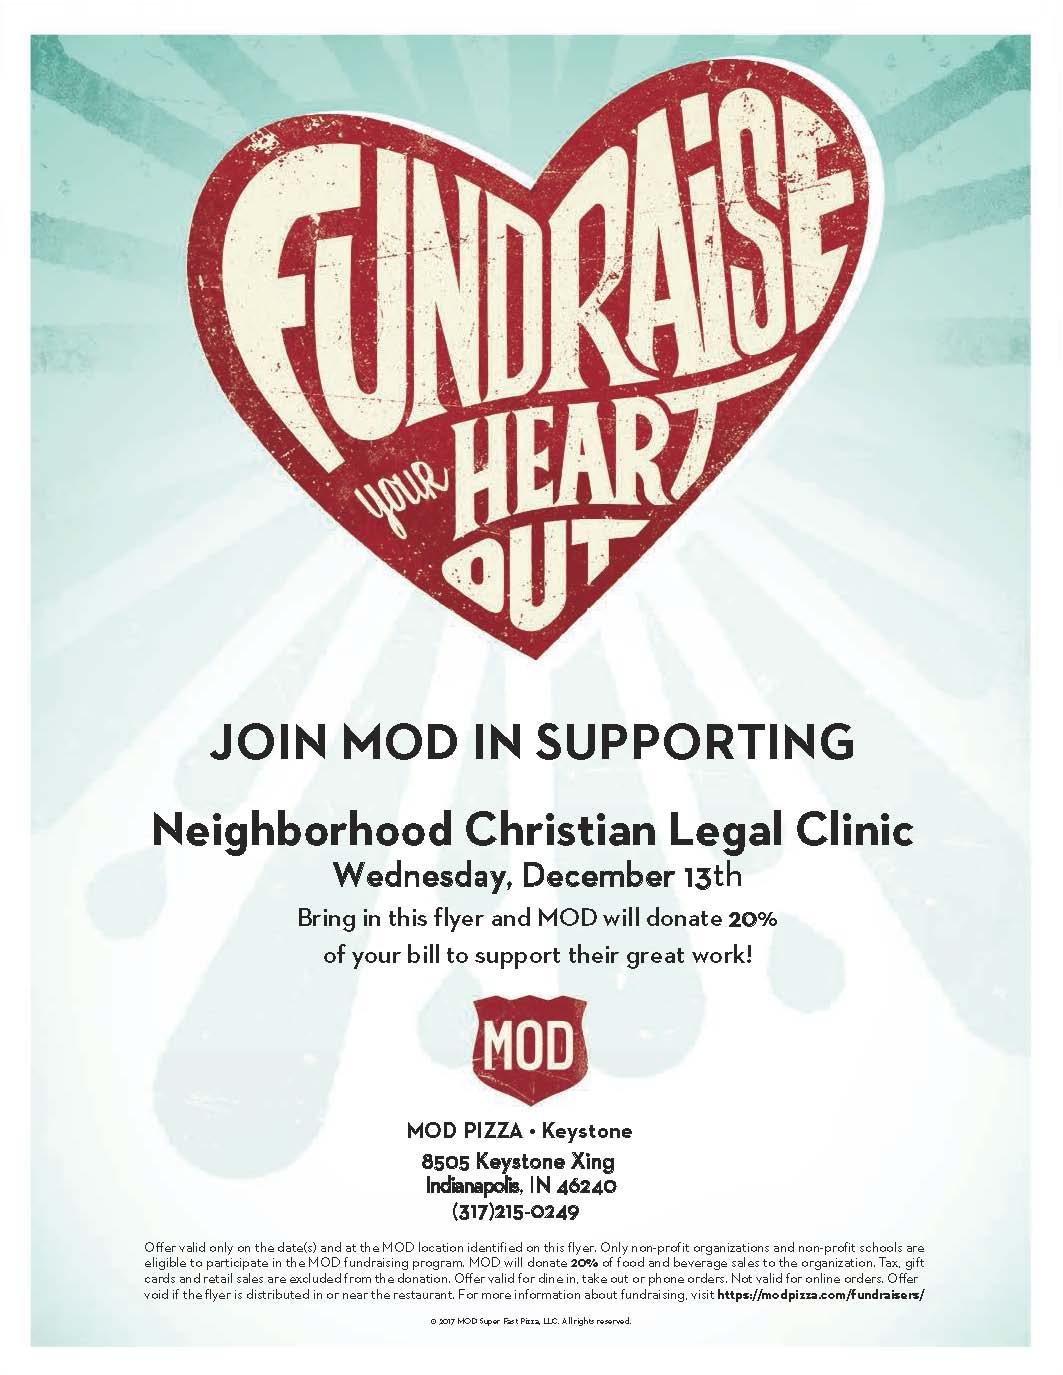 NCLC MOD Flyer.jpg